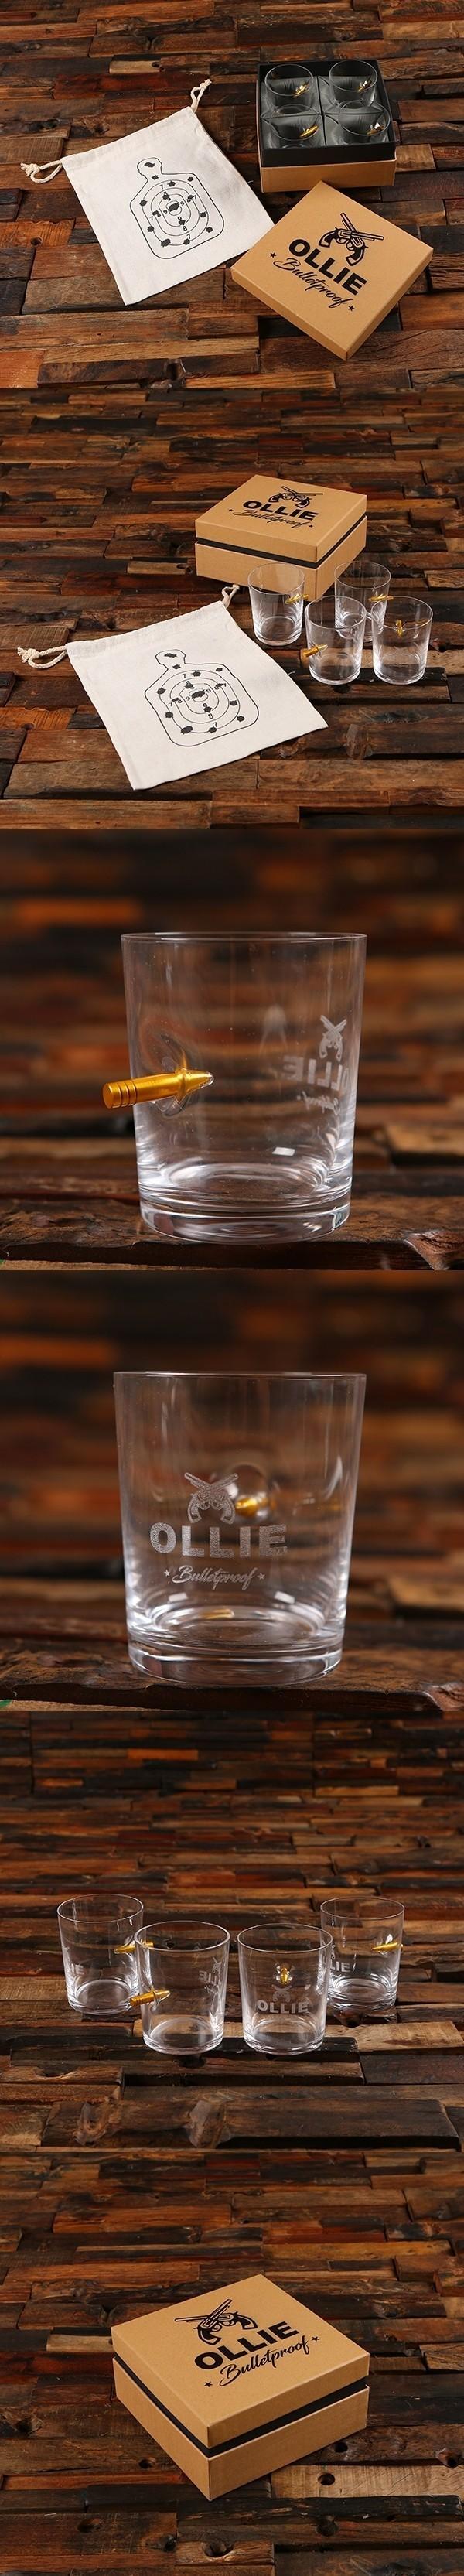 Personalized .50 Caliber Bullet Whiskey Rocks Glasses Gift-Set